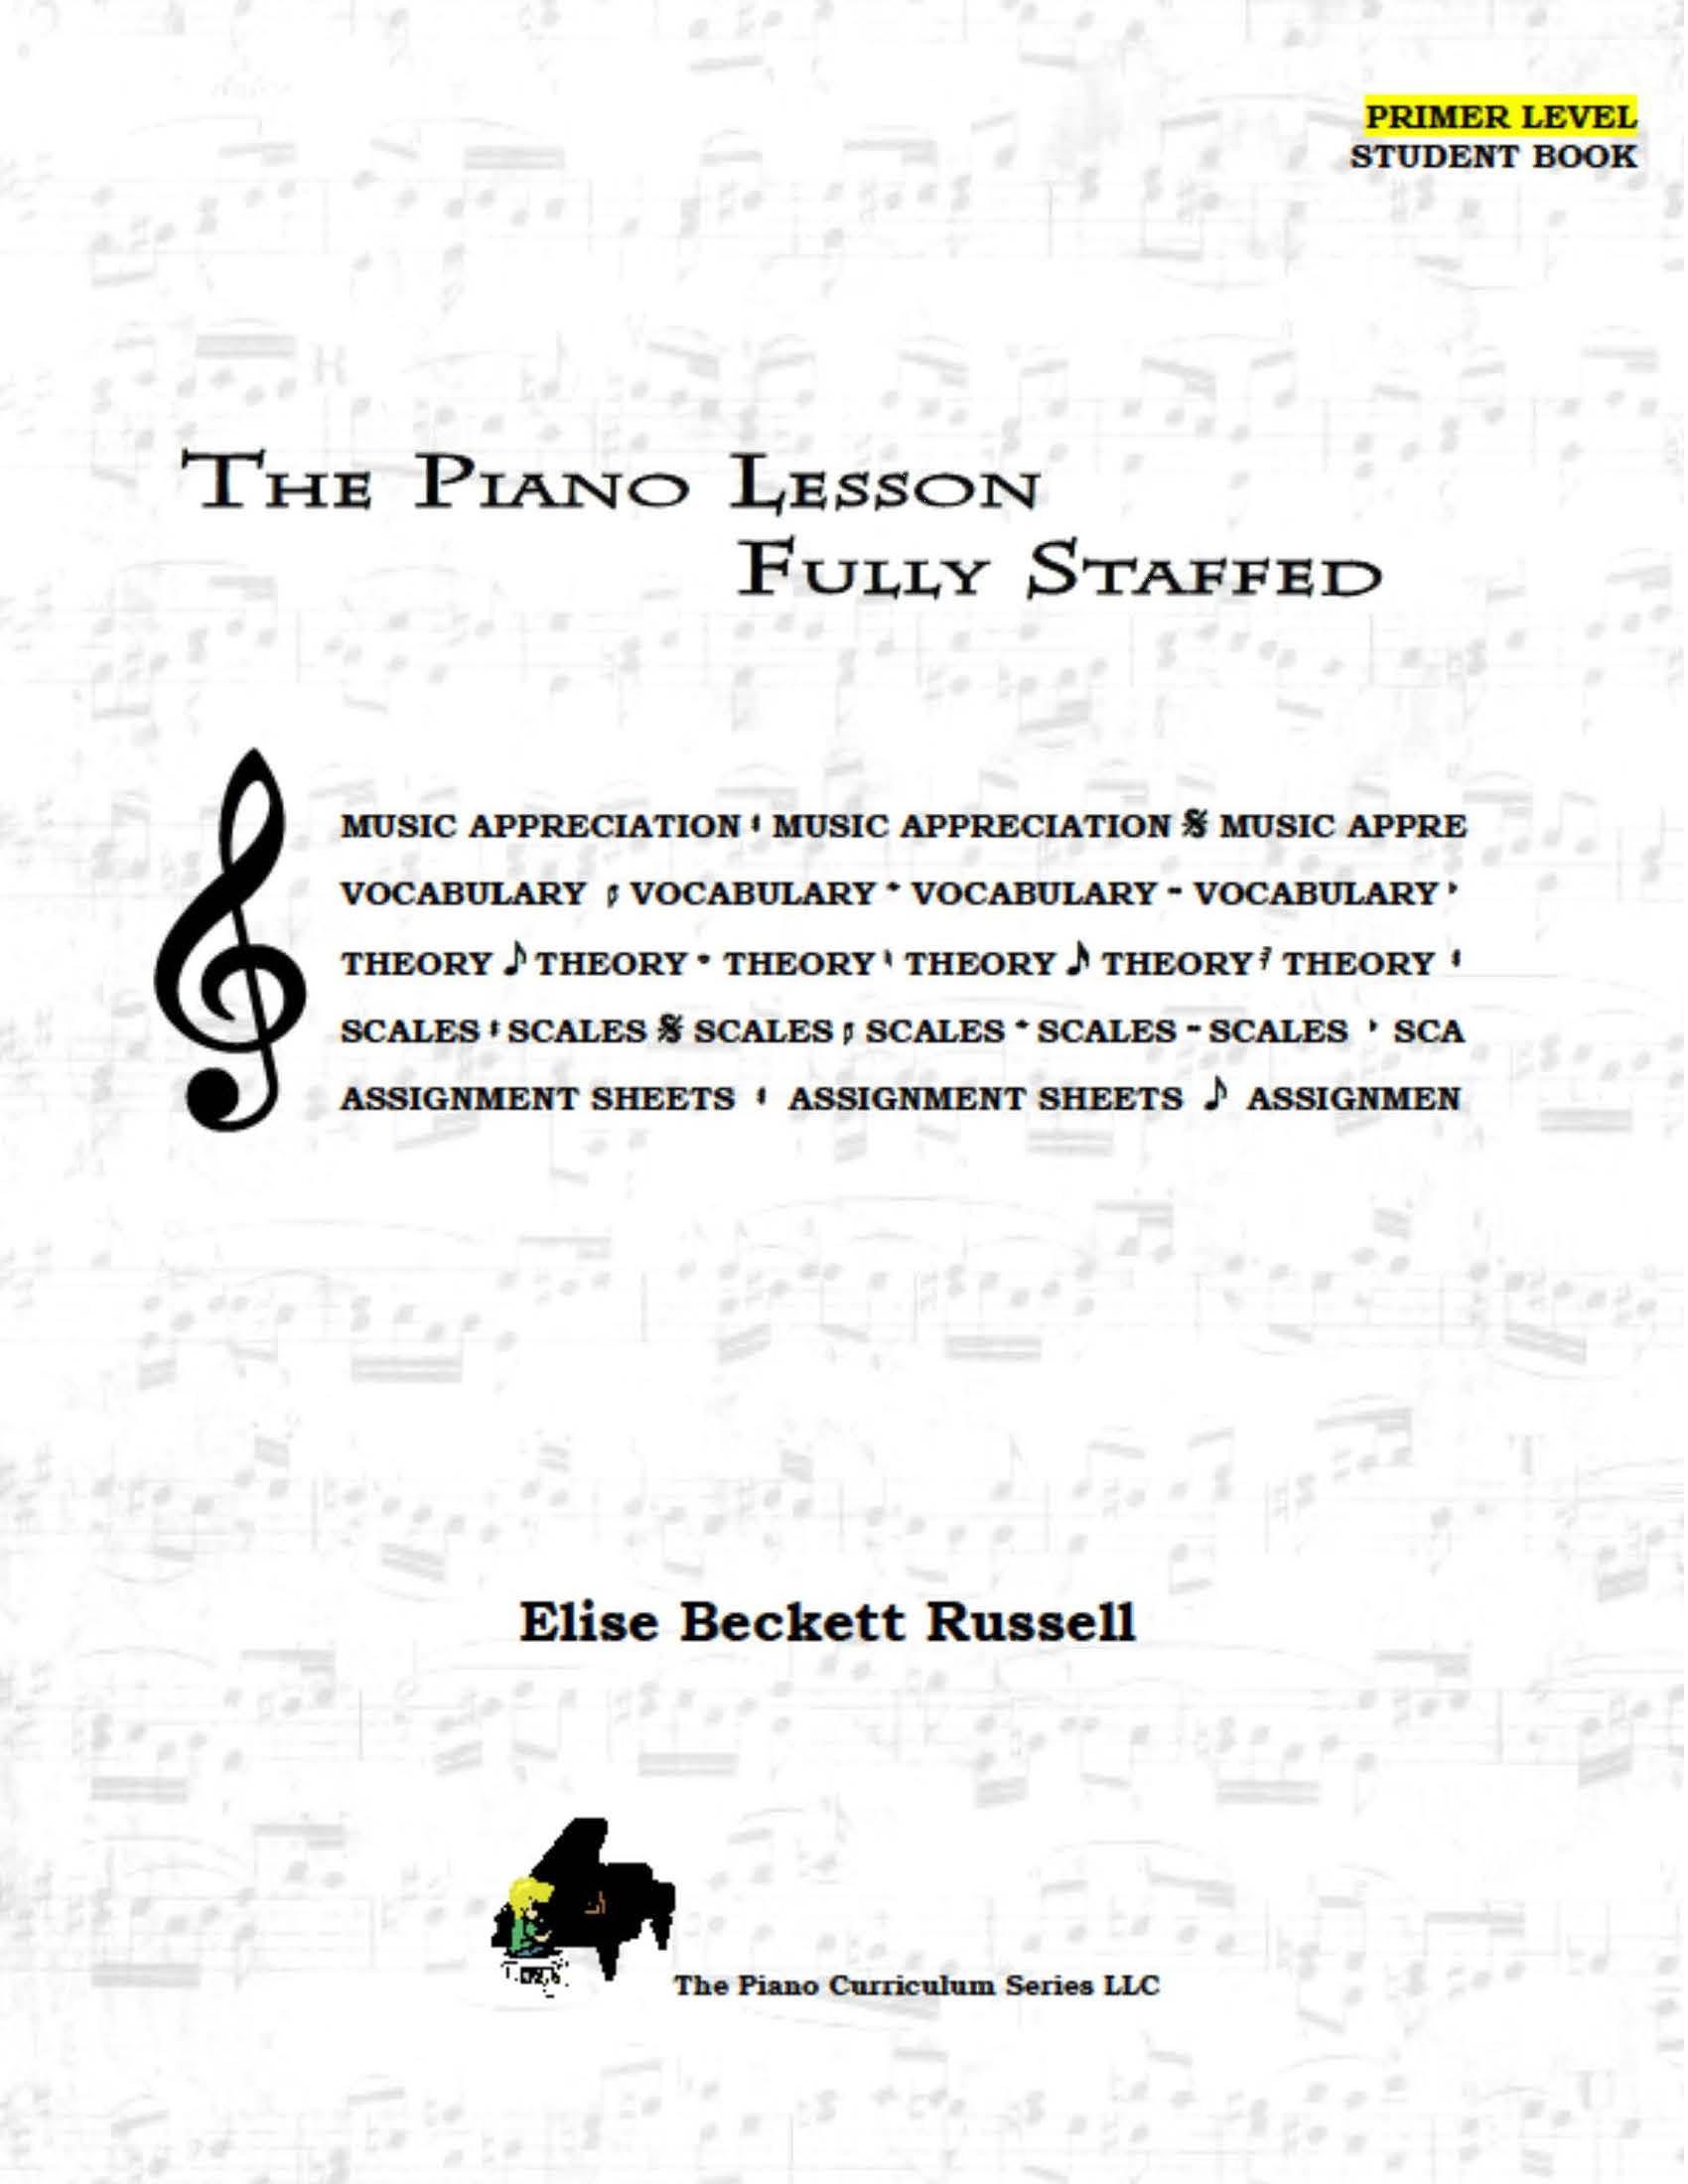 the piano lesson teacher manual p 5 piano curriculum series rh pcspiano com Piano Town Level 2 Piano Lessons in Spanish